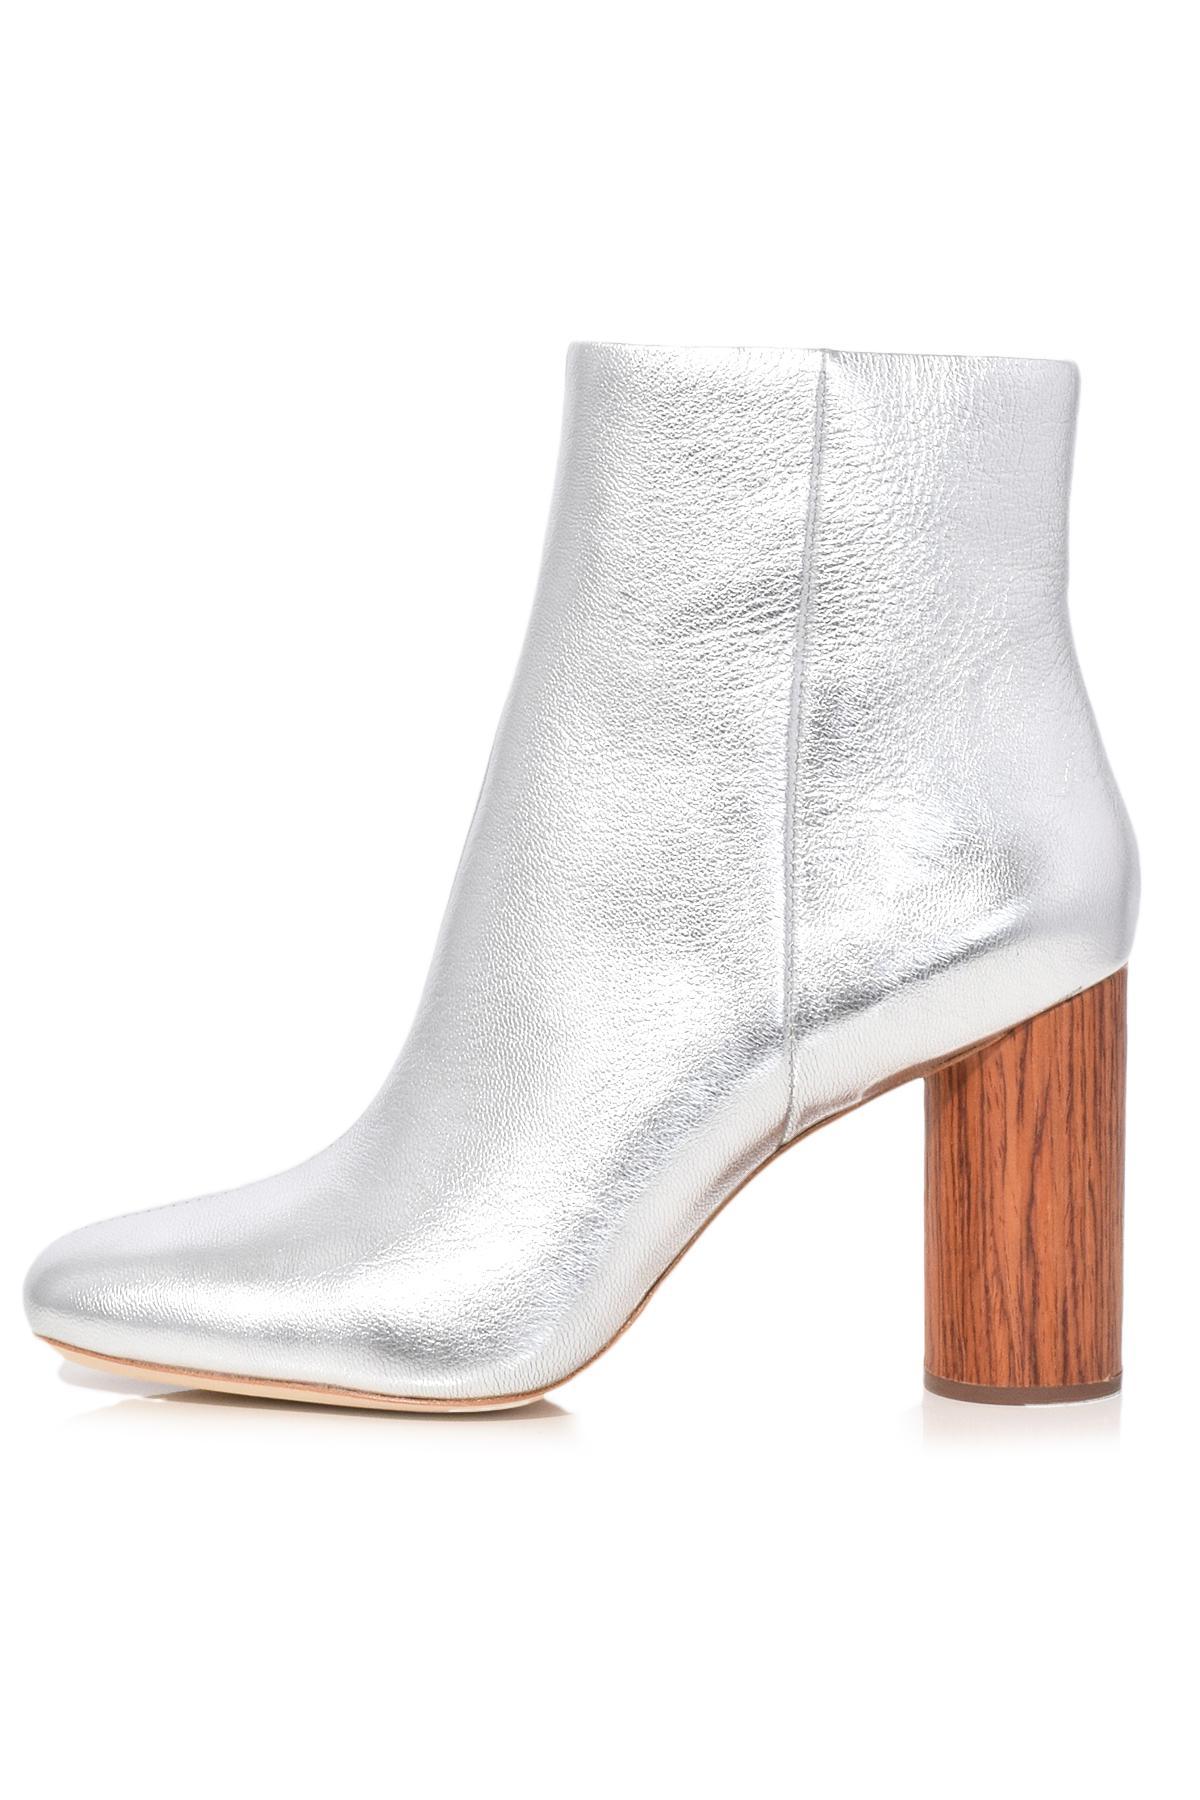 Loeffler Randall Leather Wilder Boot In